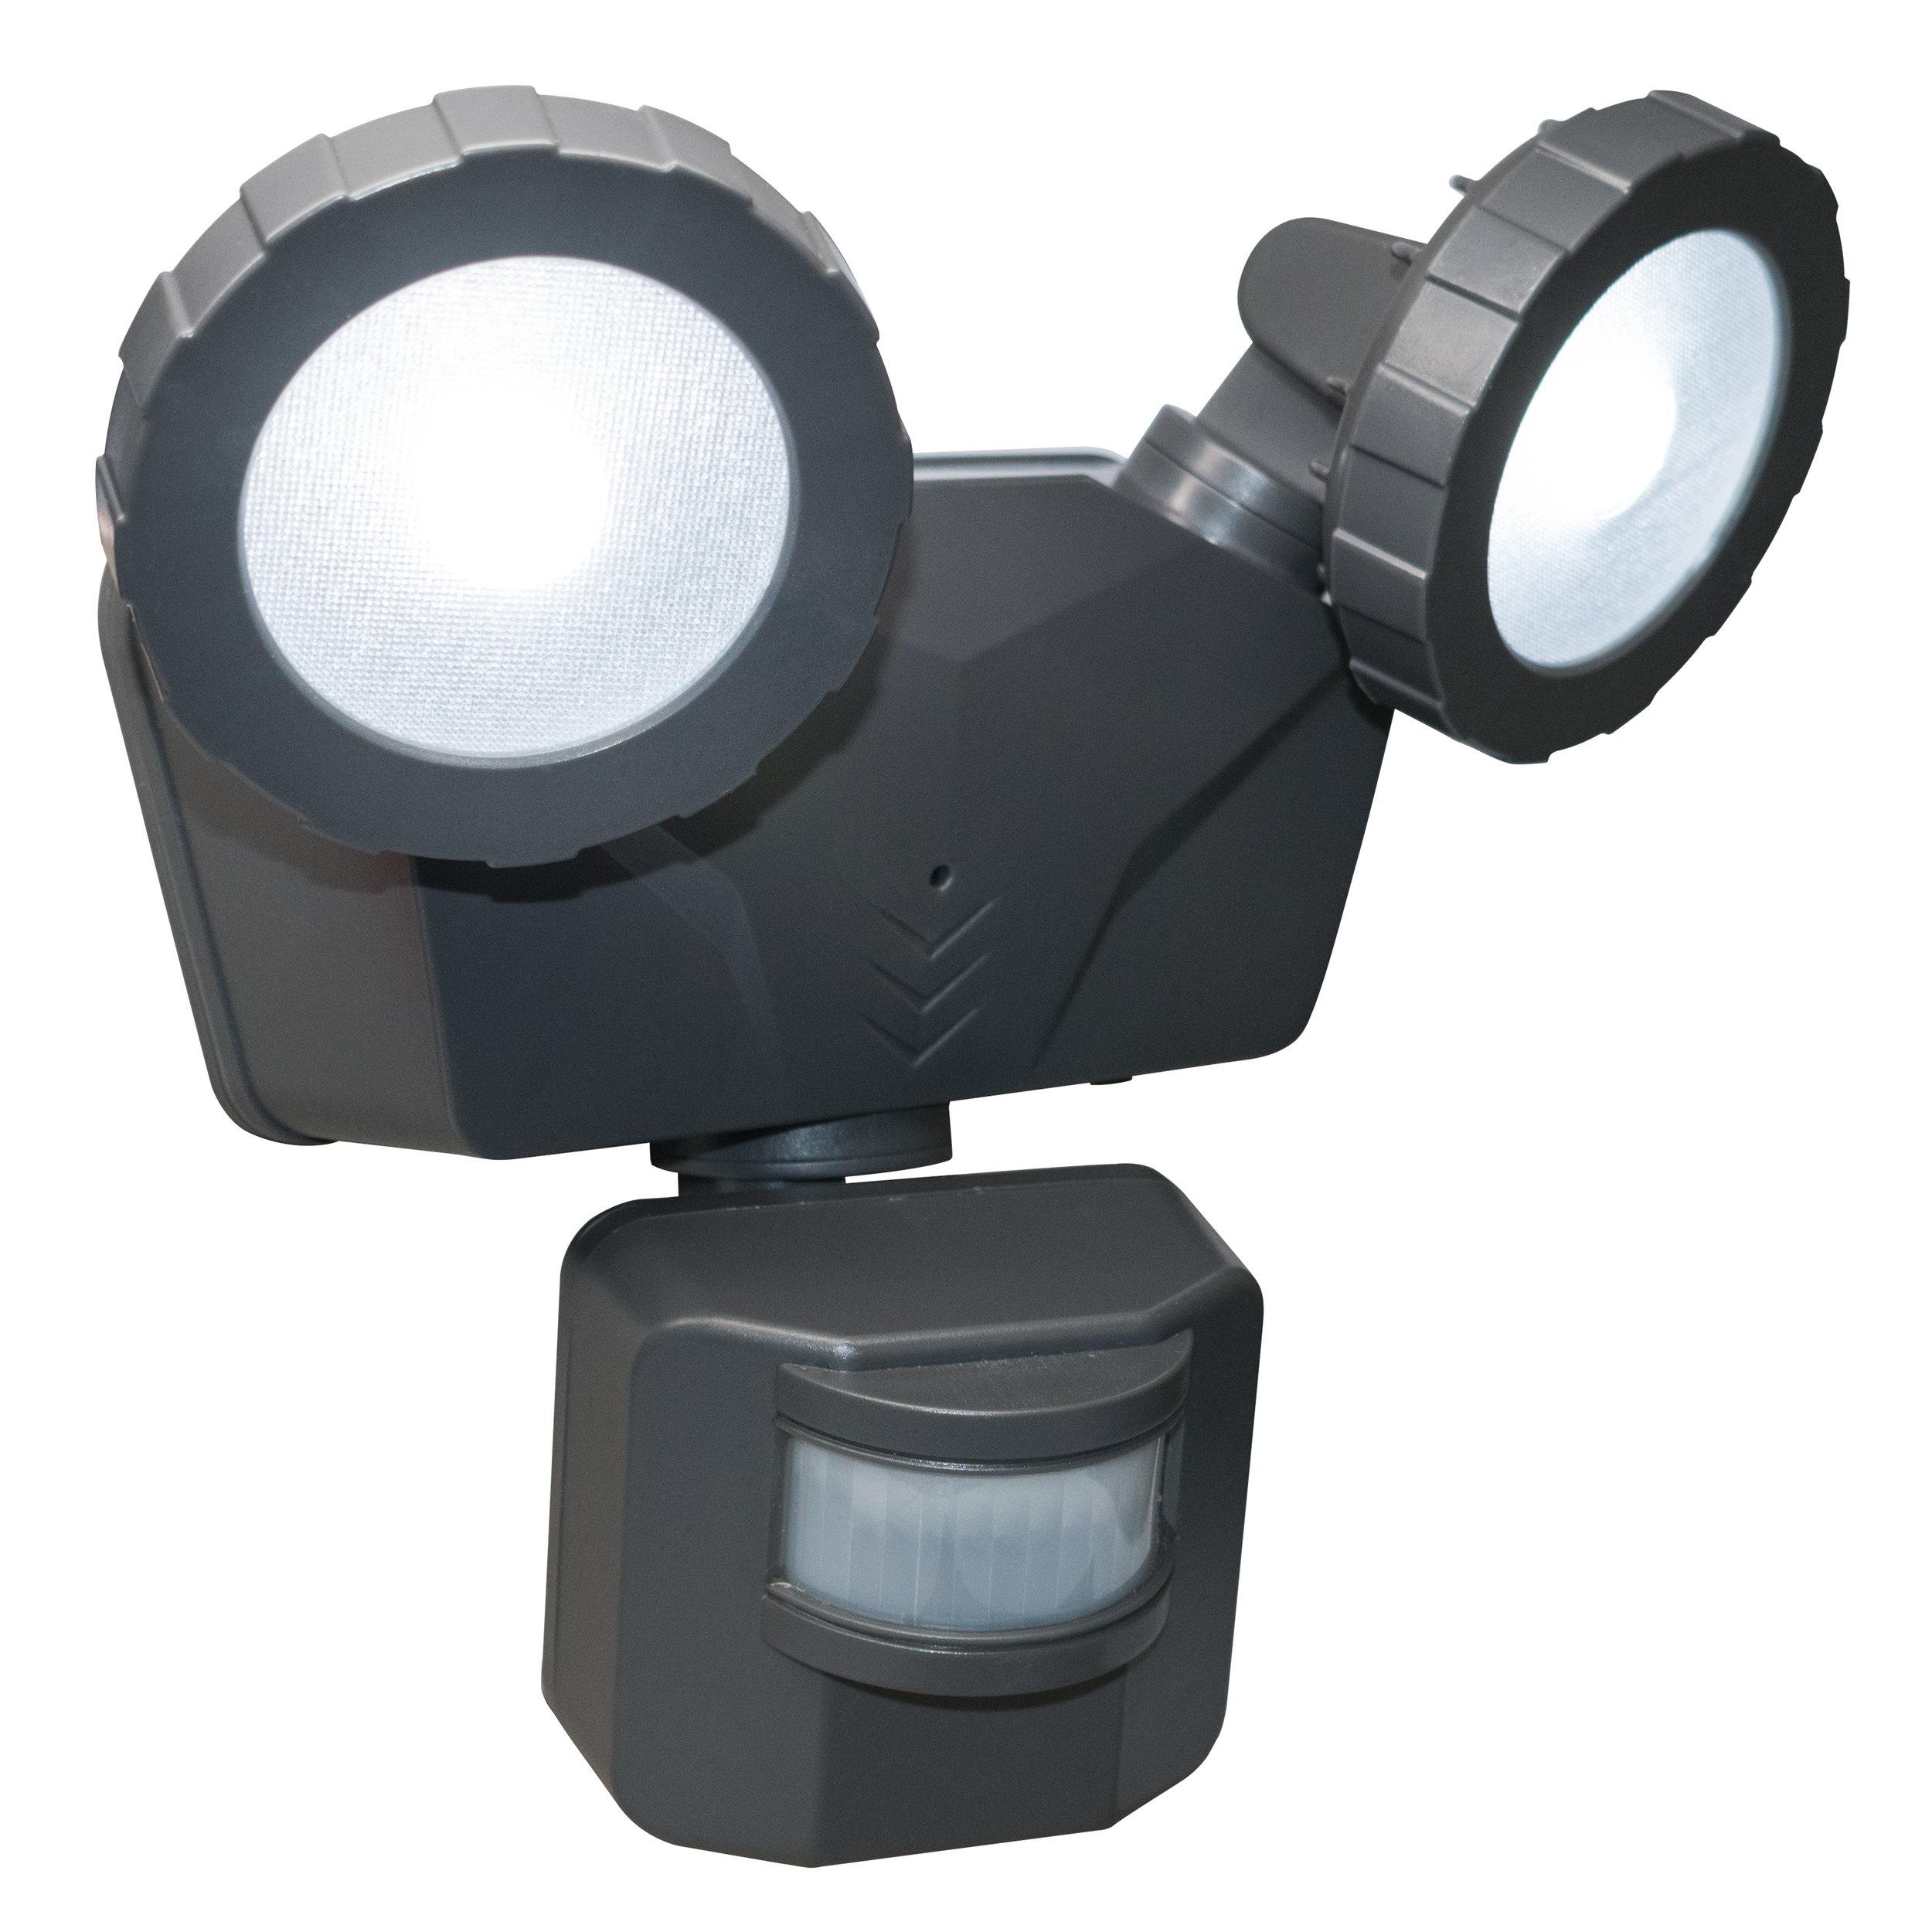 NL-DSG2 Solar Security Light, Isometric